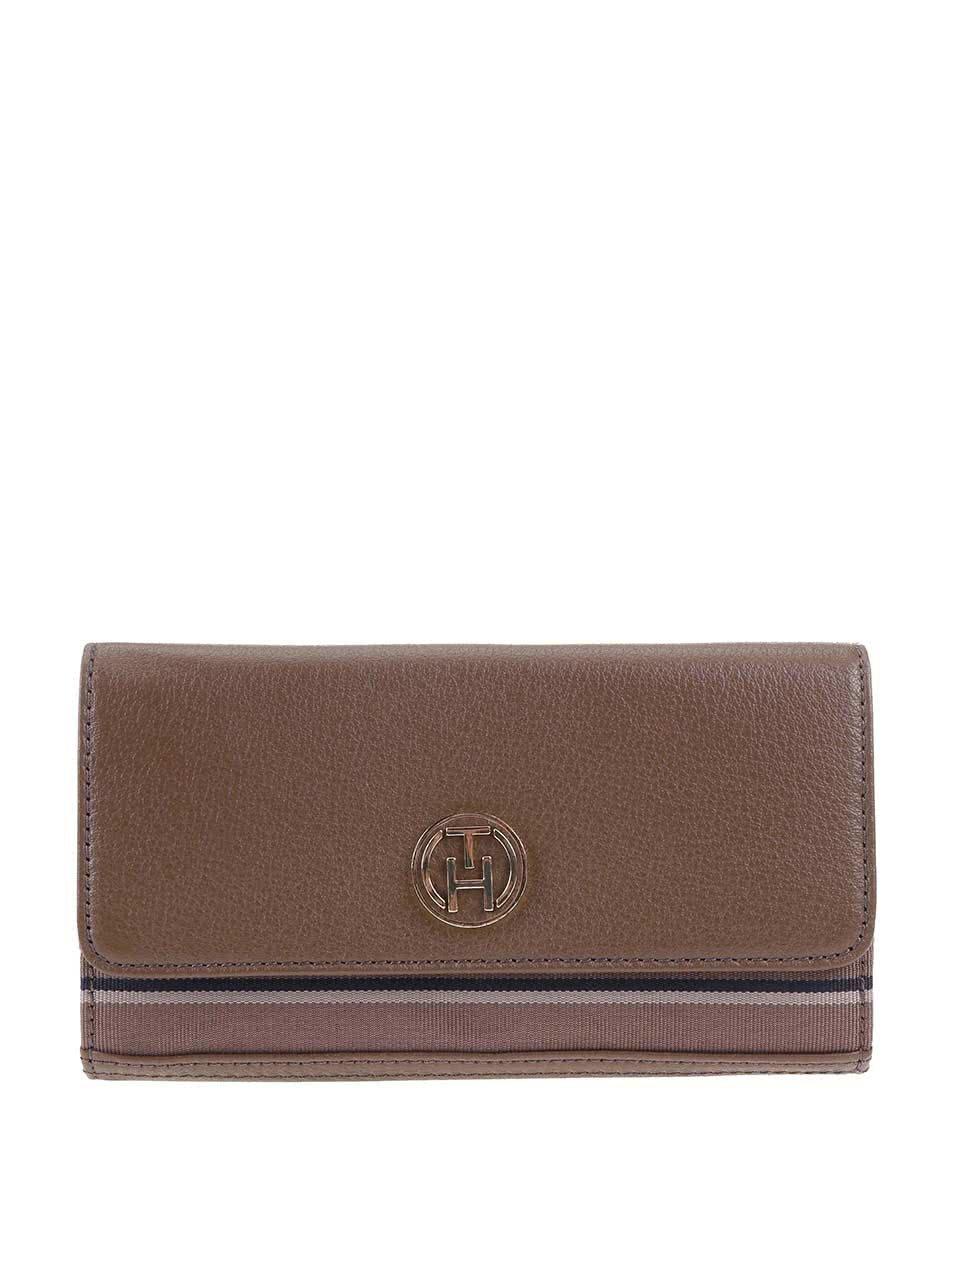 Hnedá dámska peňaženka Tommy Hilfiger Rosanna ... cb5220ed8ea